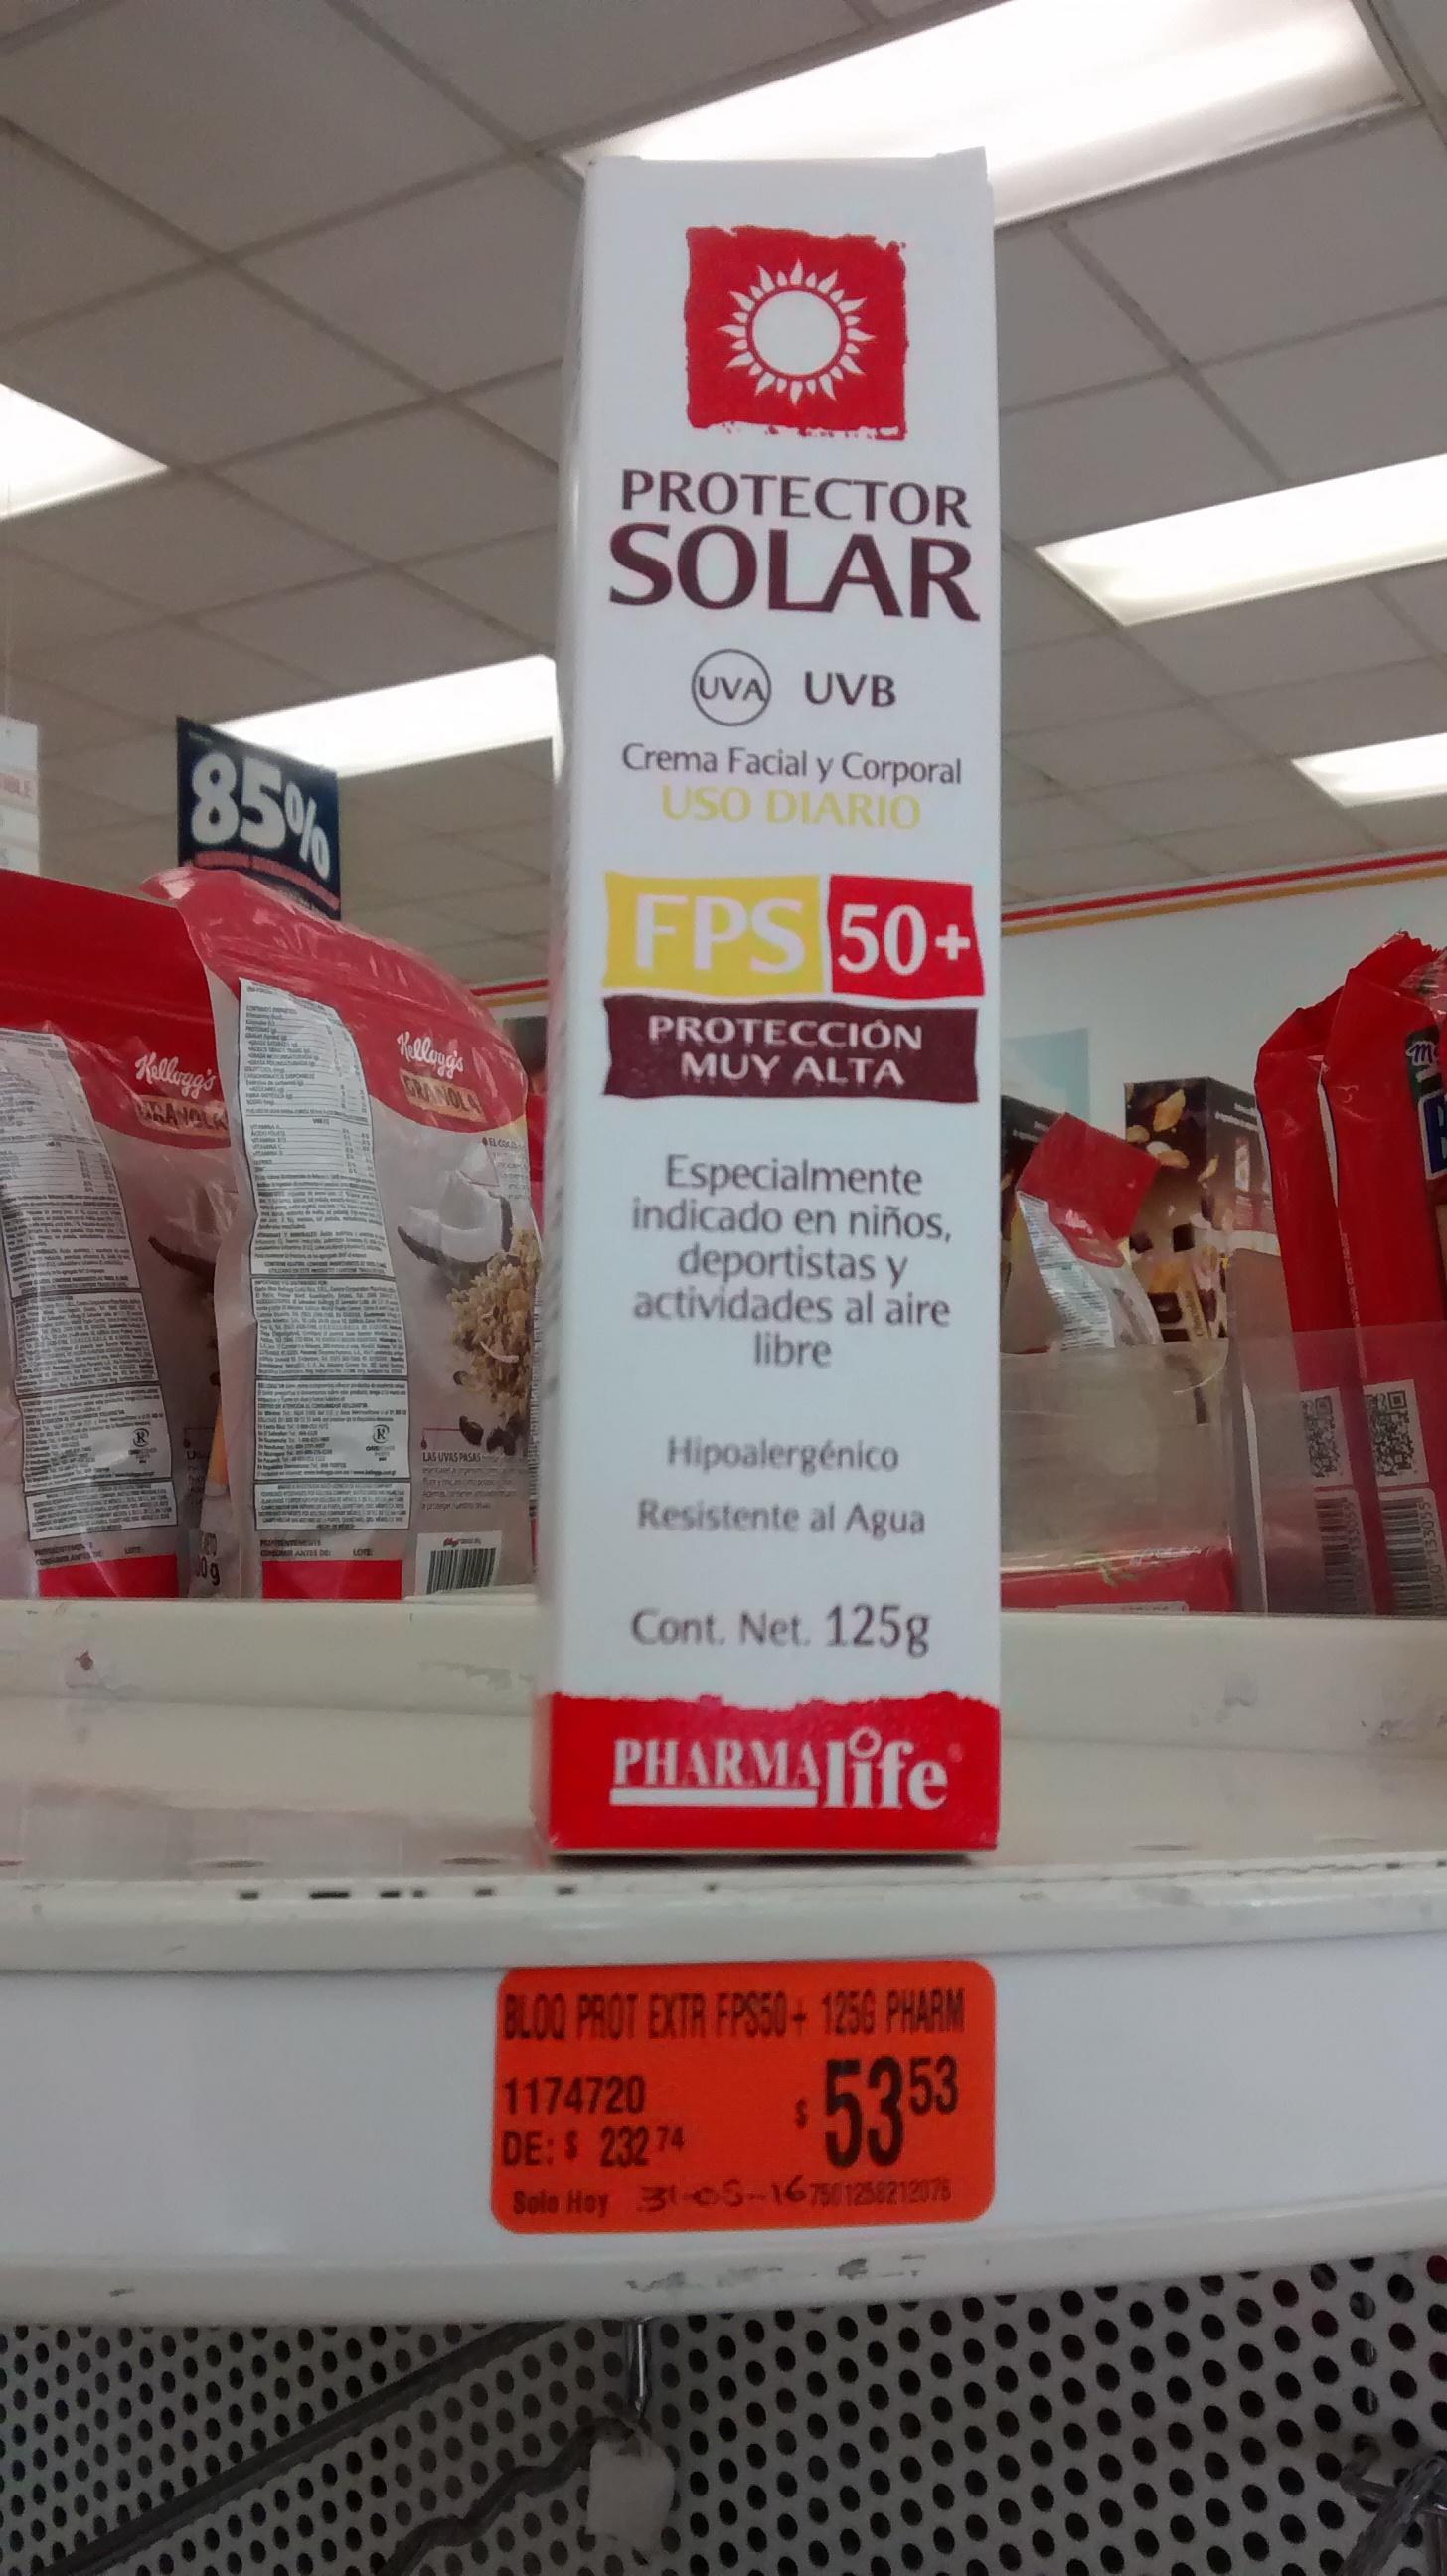 Farmacias Guadalajara: Protector solar 50FPS pharmalife a $54